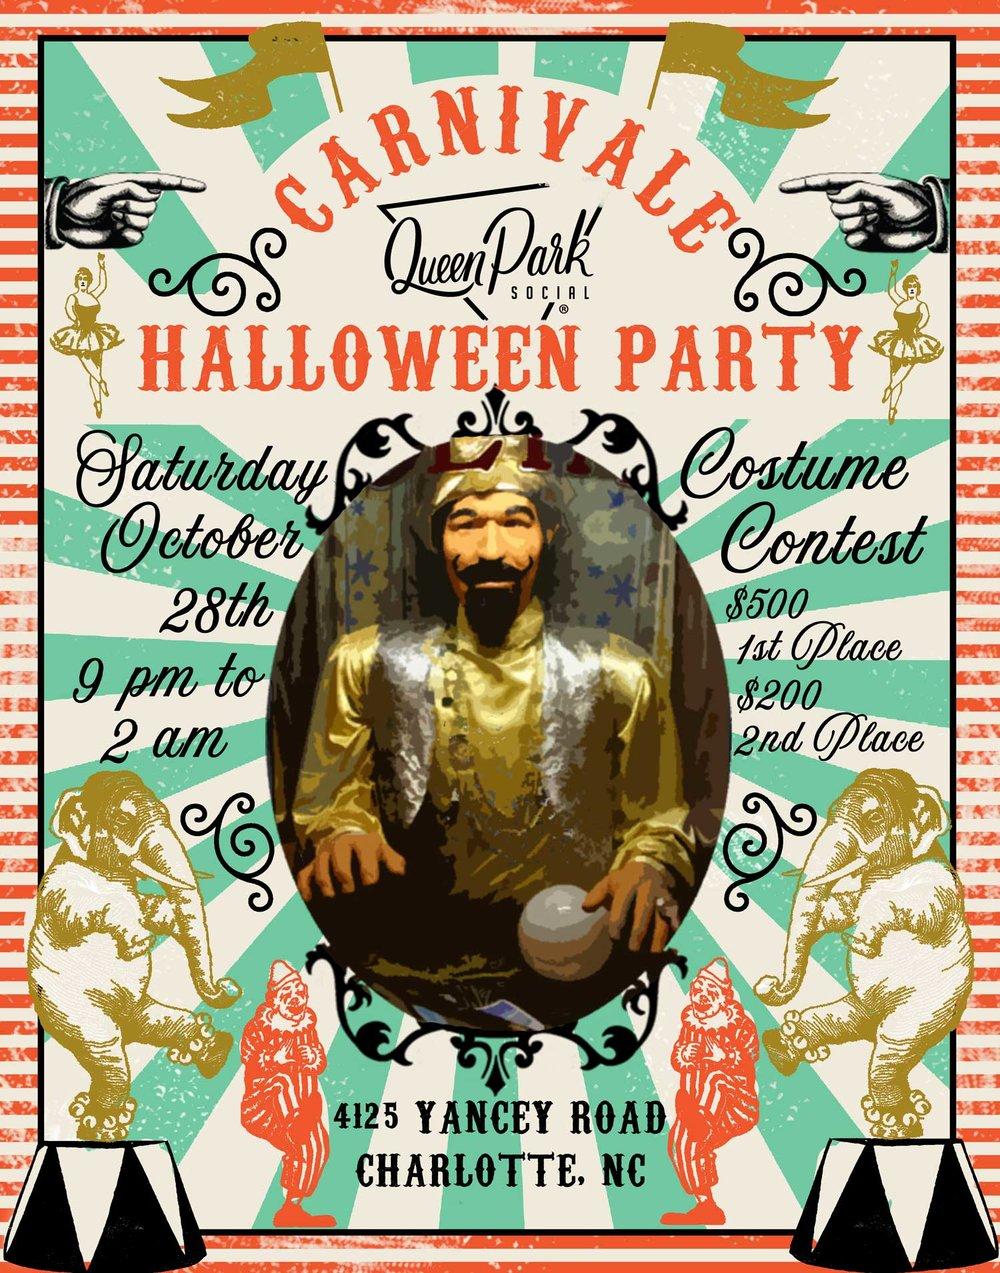 Queen Park Social Halloween Party